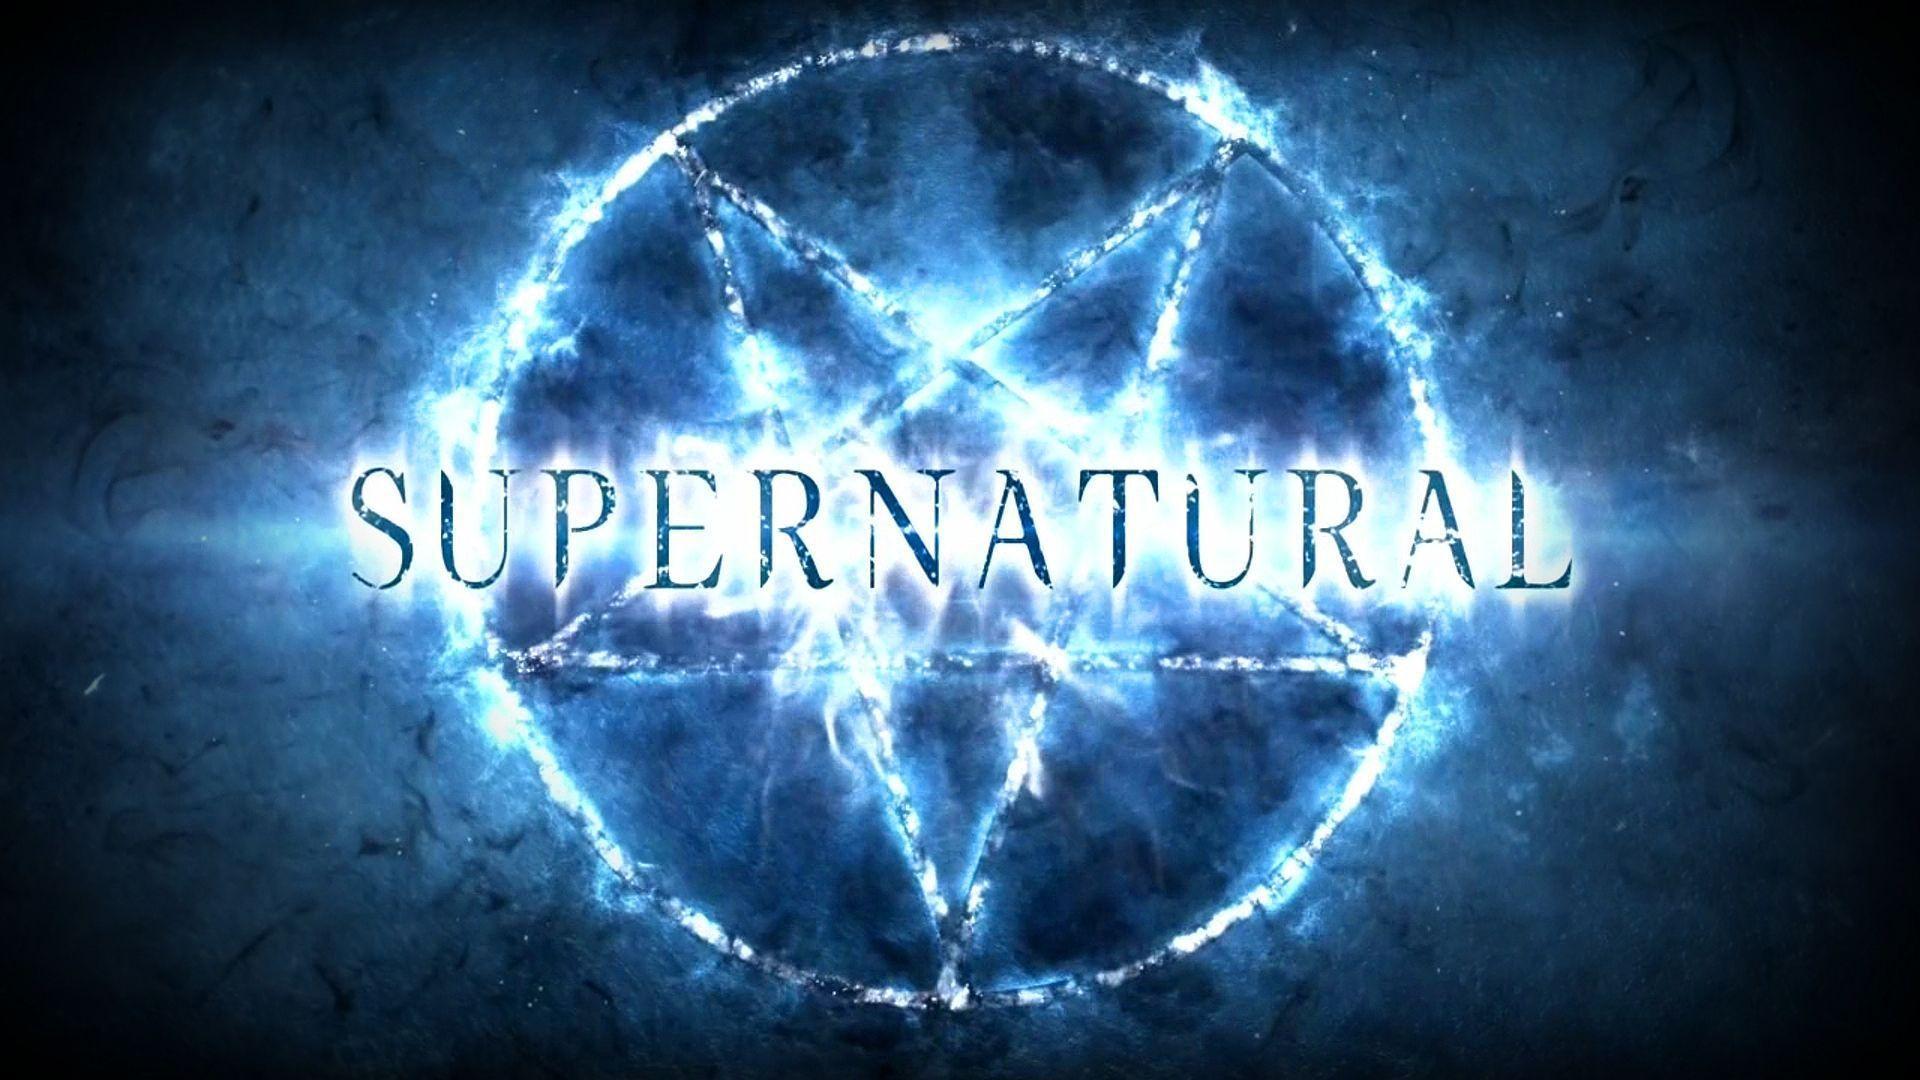 like cw supernatural wallpaper - photo #33